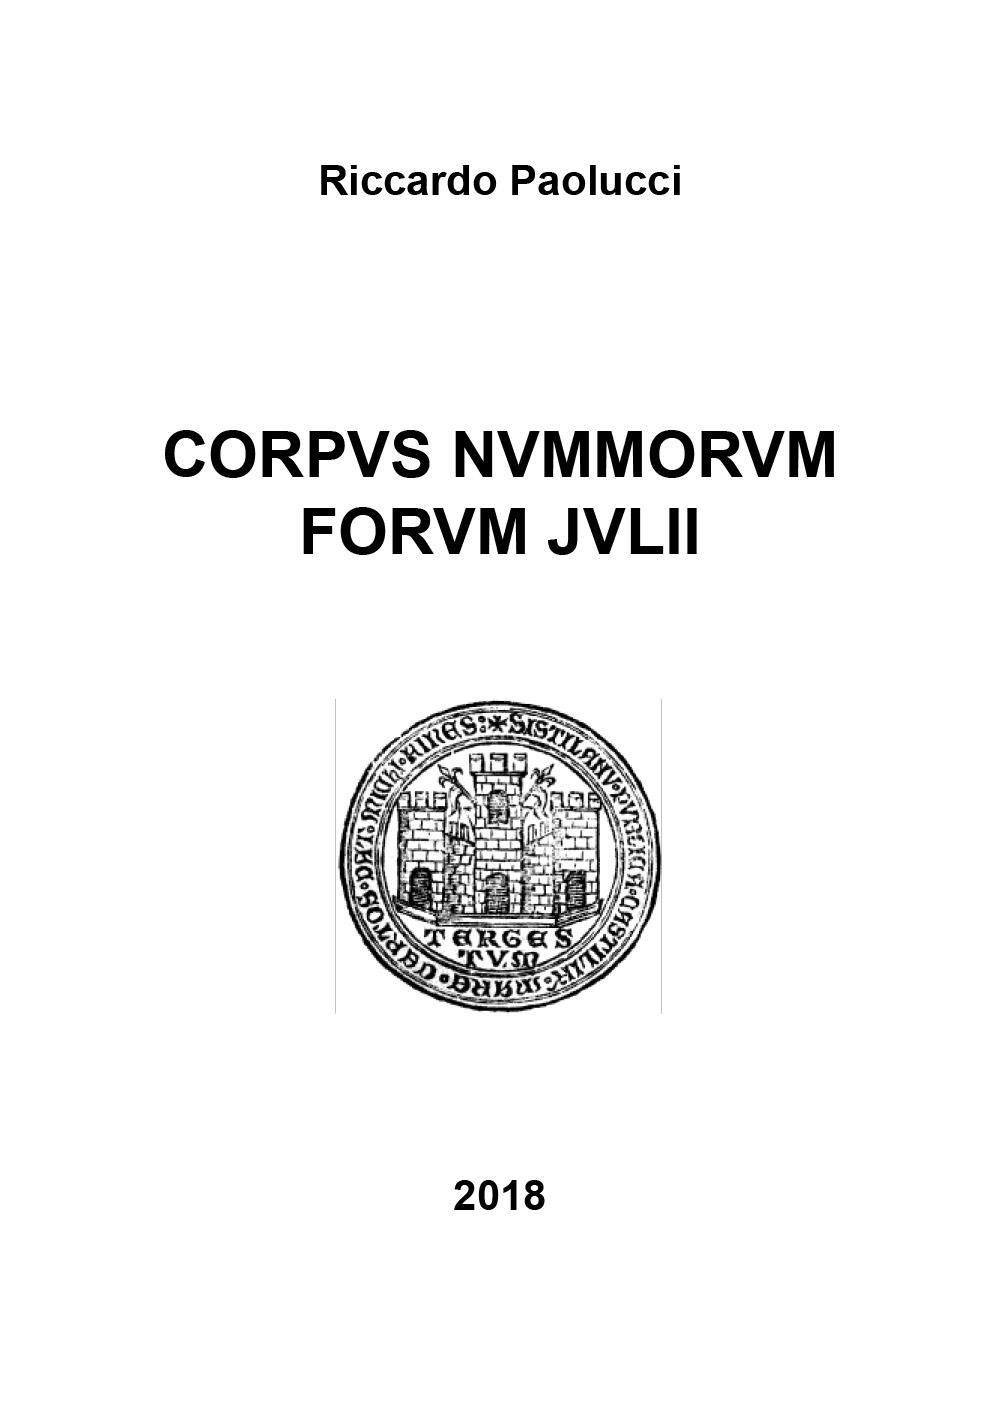 Corpus nummorum forum julii